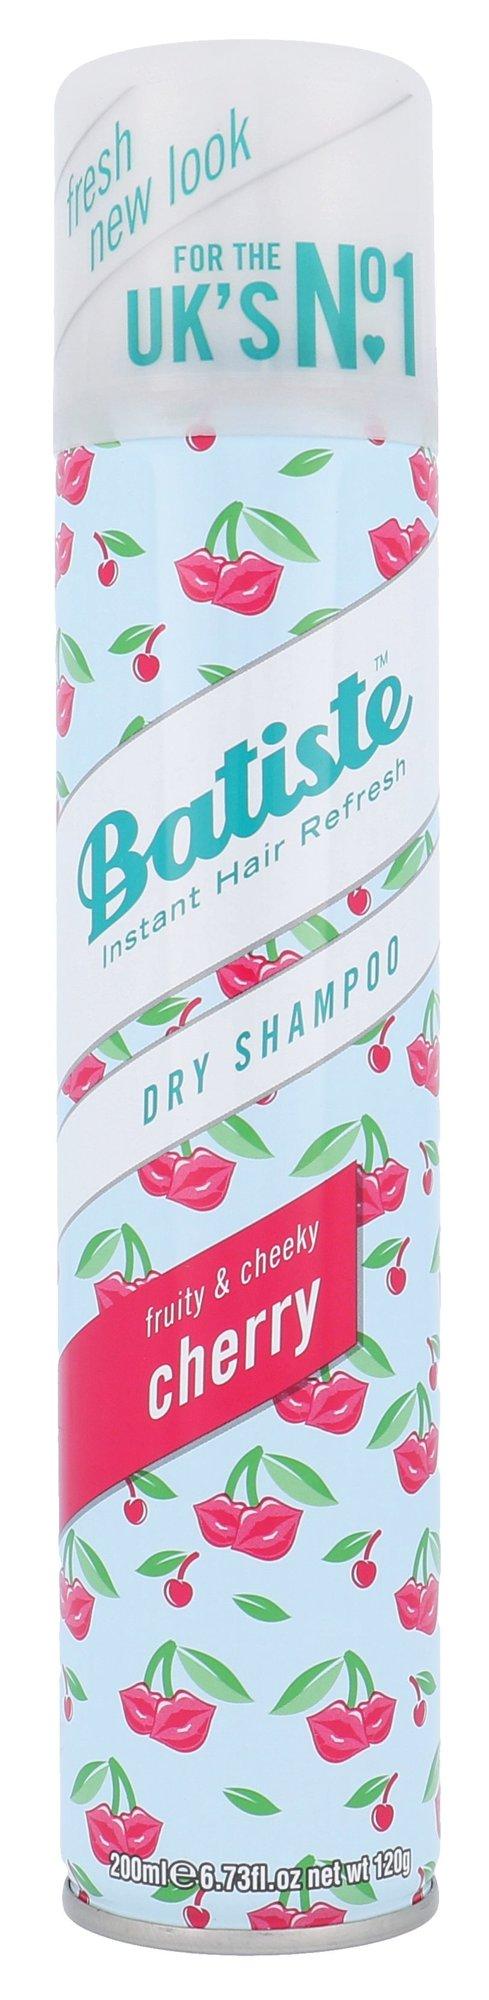 Batiste Cherry Cosmetic 200ml